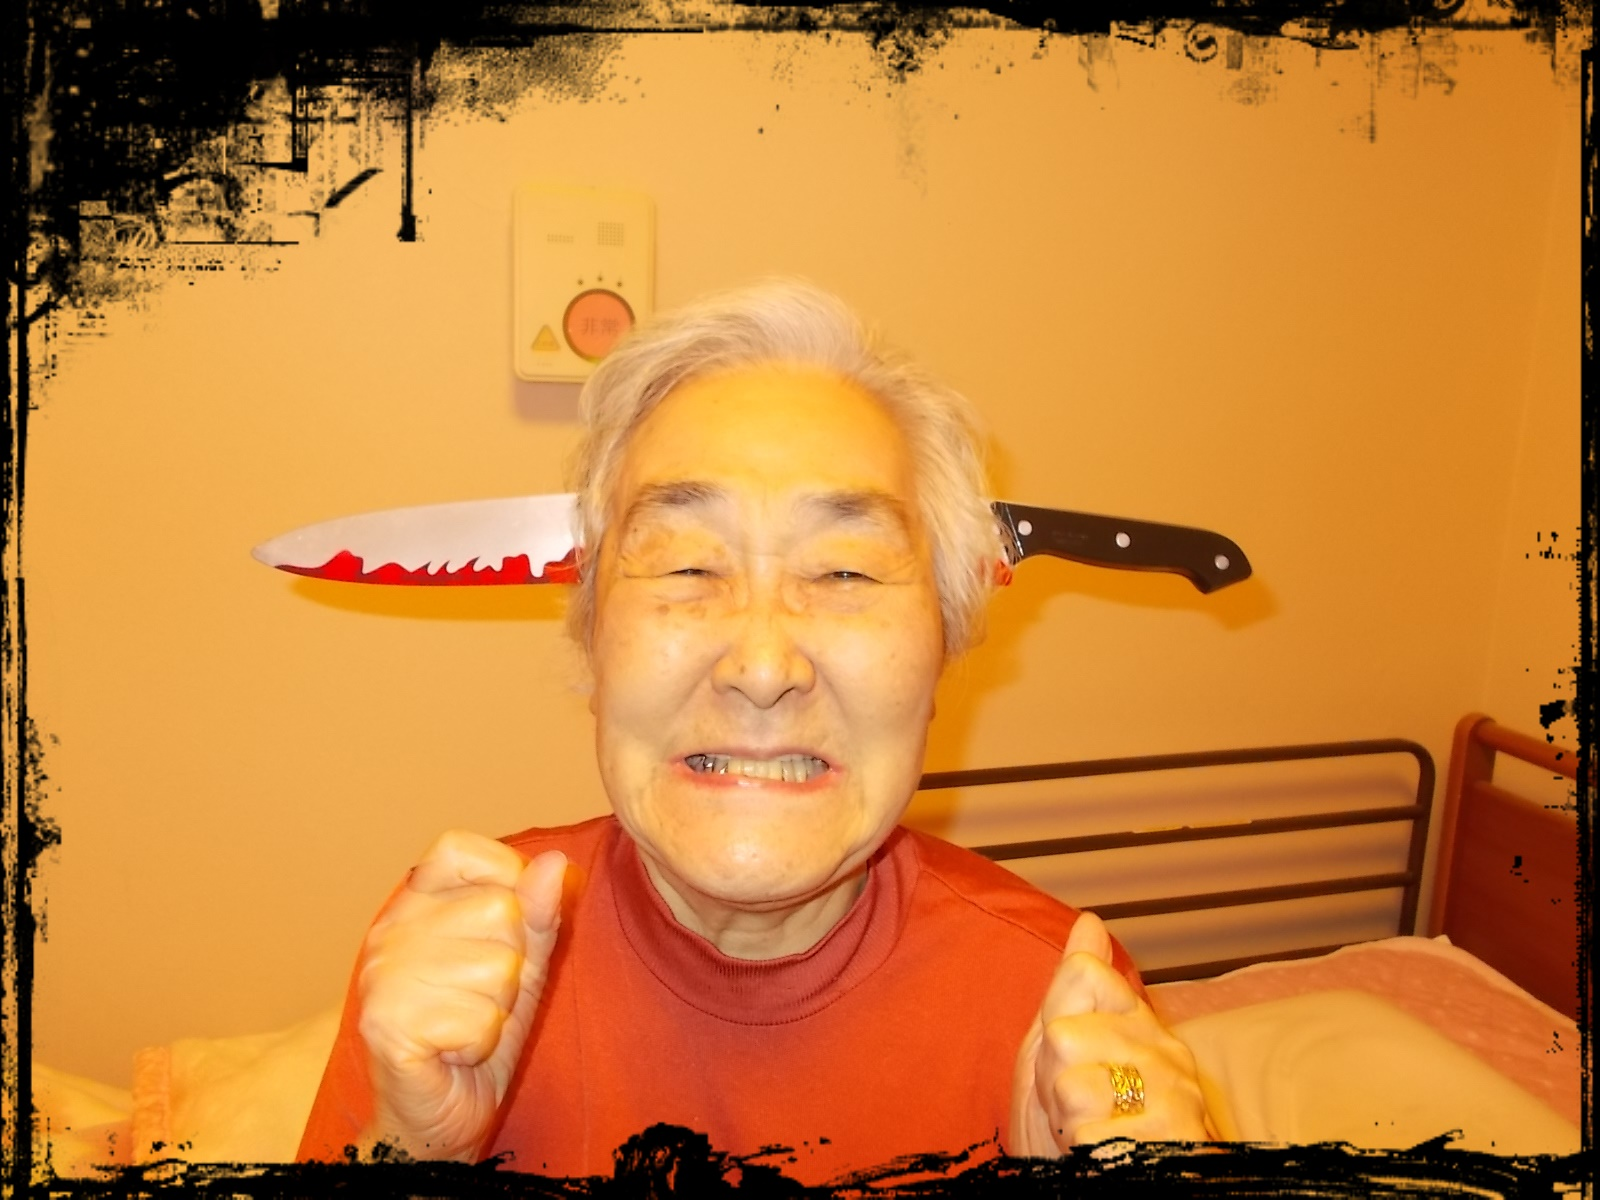 http://www.supercourt.jp/blog/hirano/DSCN1493.JPG